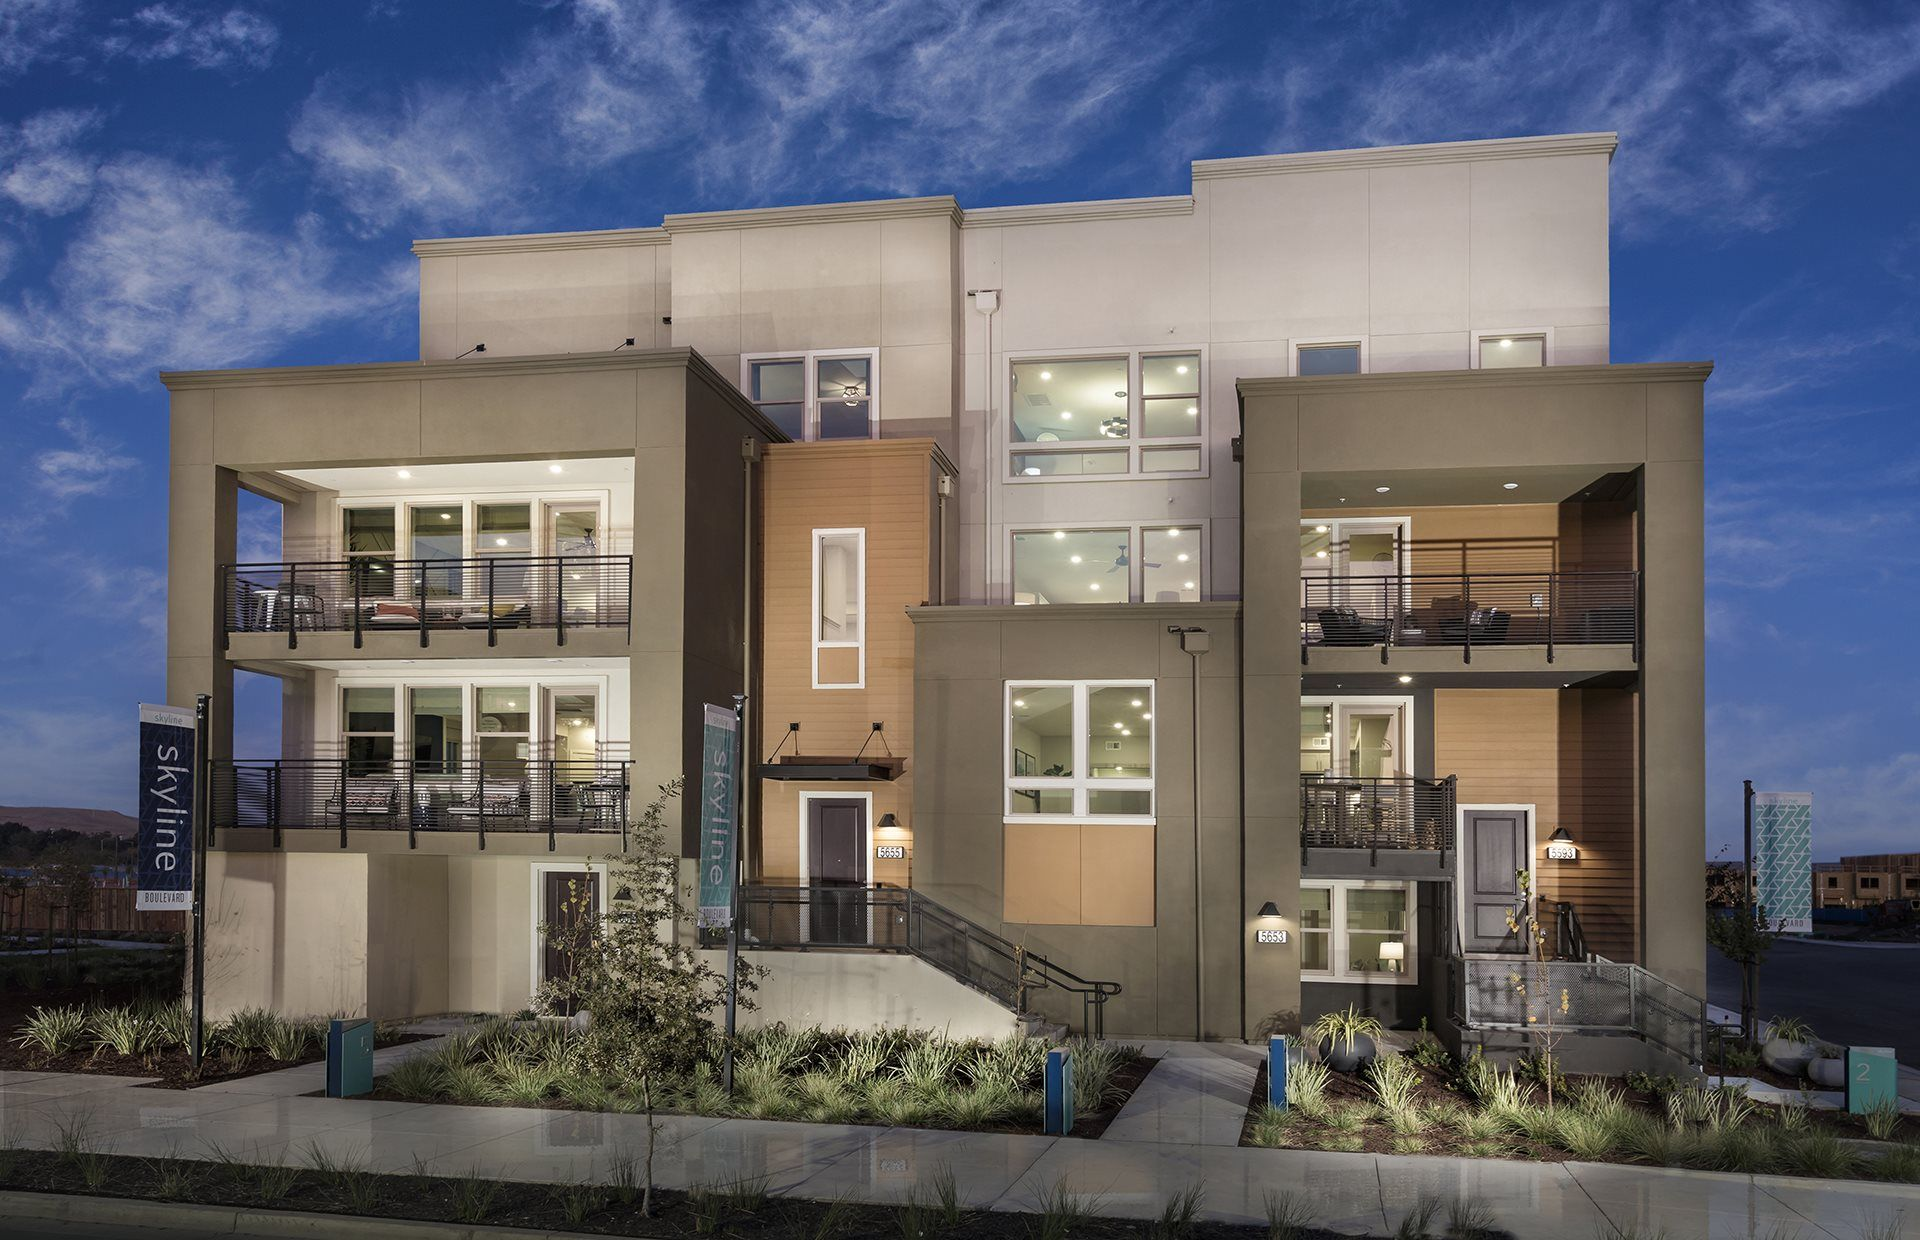 'Boulevard - Skyline' by Lennar - Bay Area Homebuilding in Oakland-Alameda